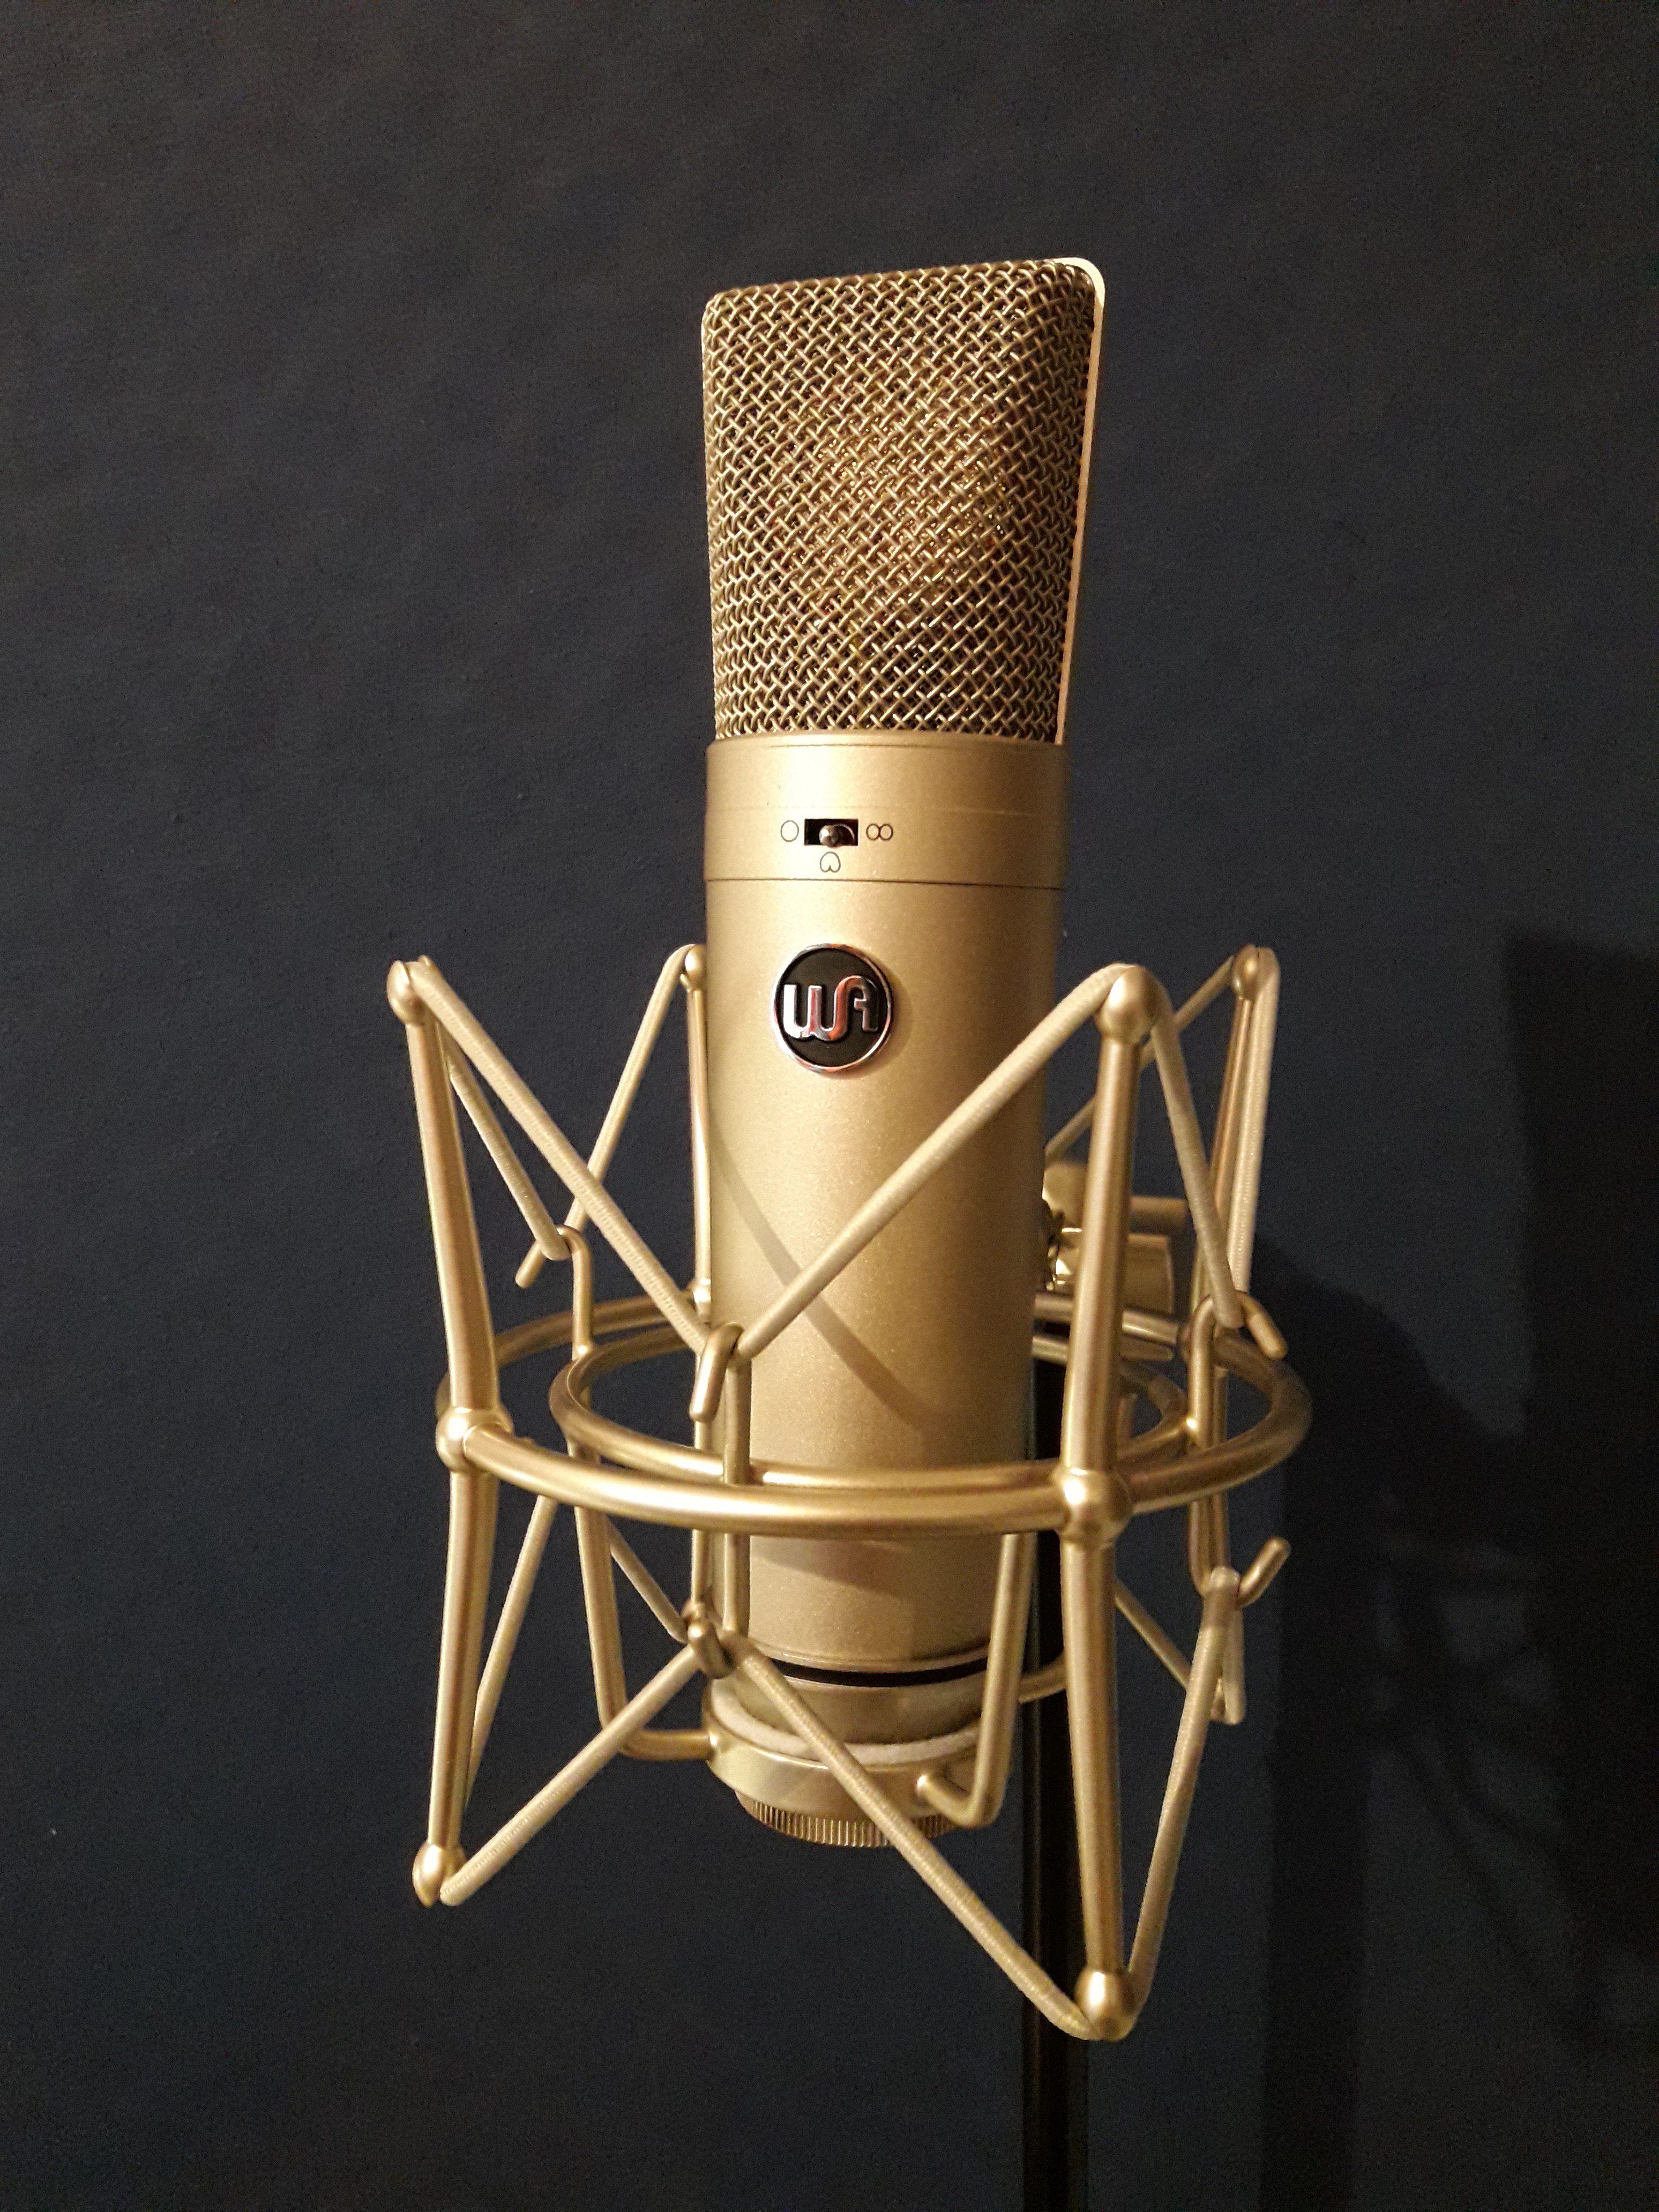 Diverse Mikrofone: Warm Audio, Aston Microphones, Weissklang, AKG, Audio Technica